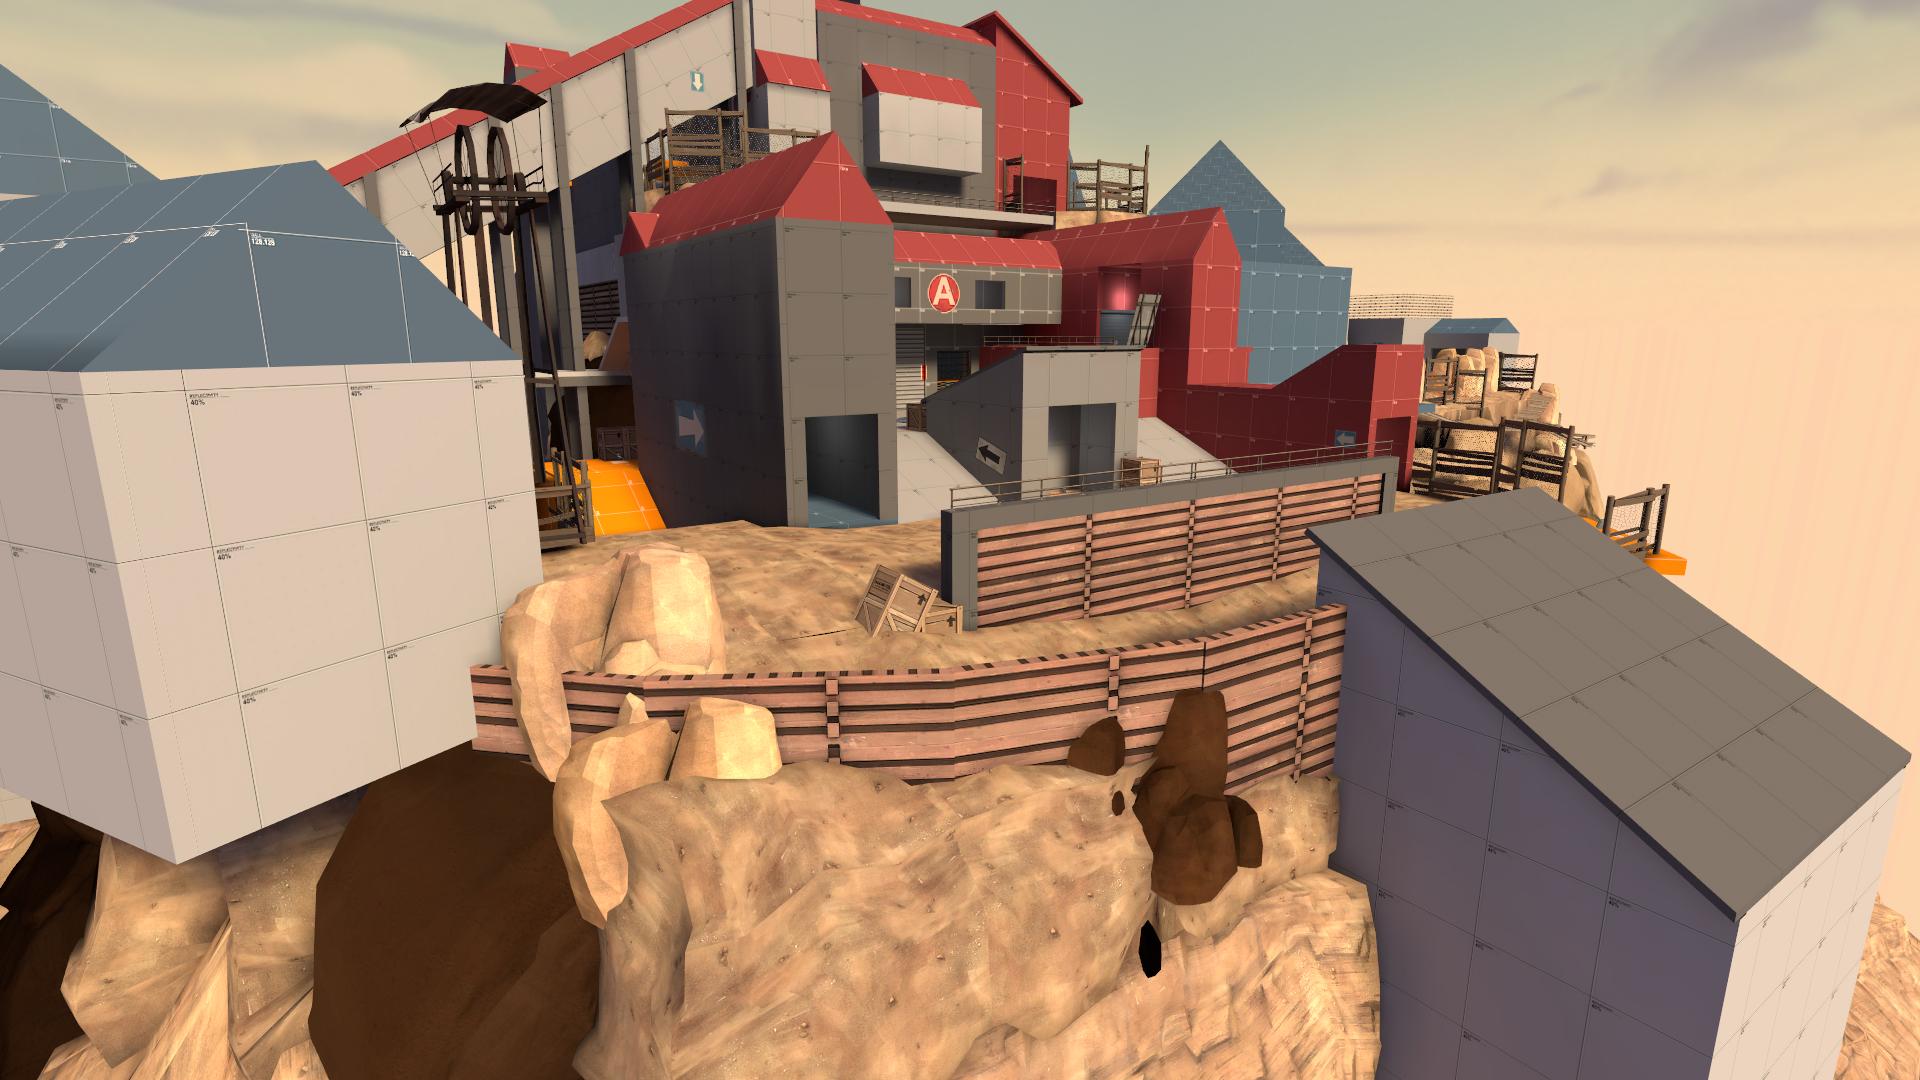 Team Fortress 2 Screenshot 2020.01.17 - 21.36.04.63.png